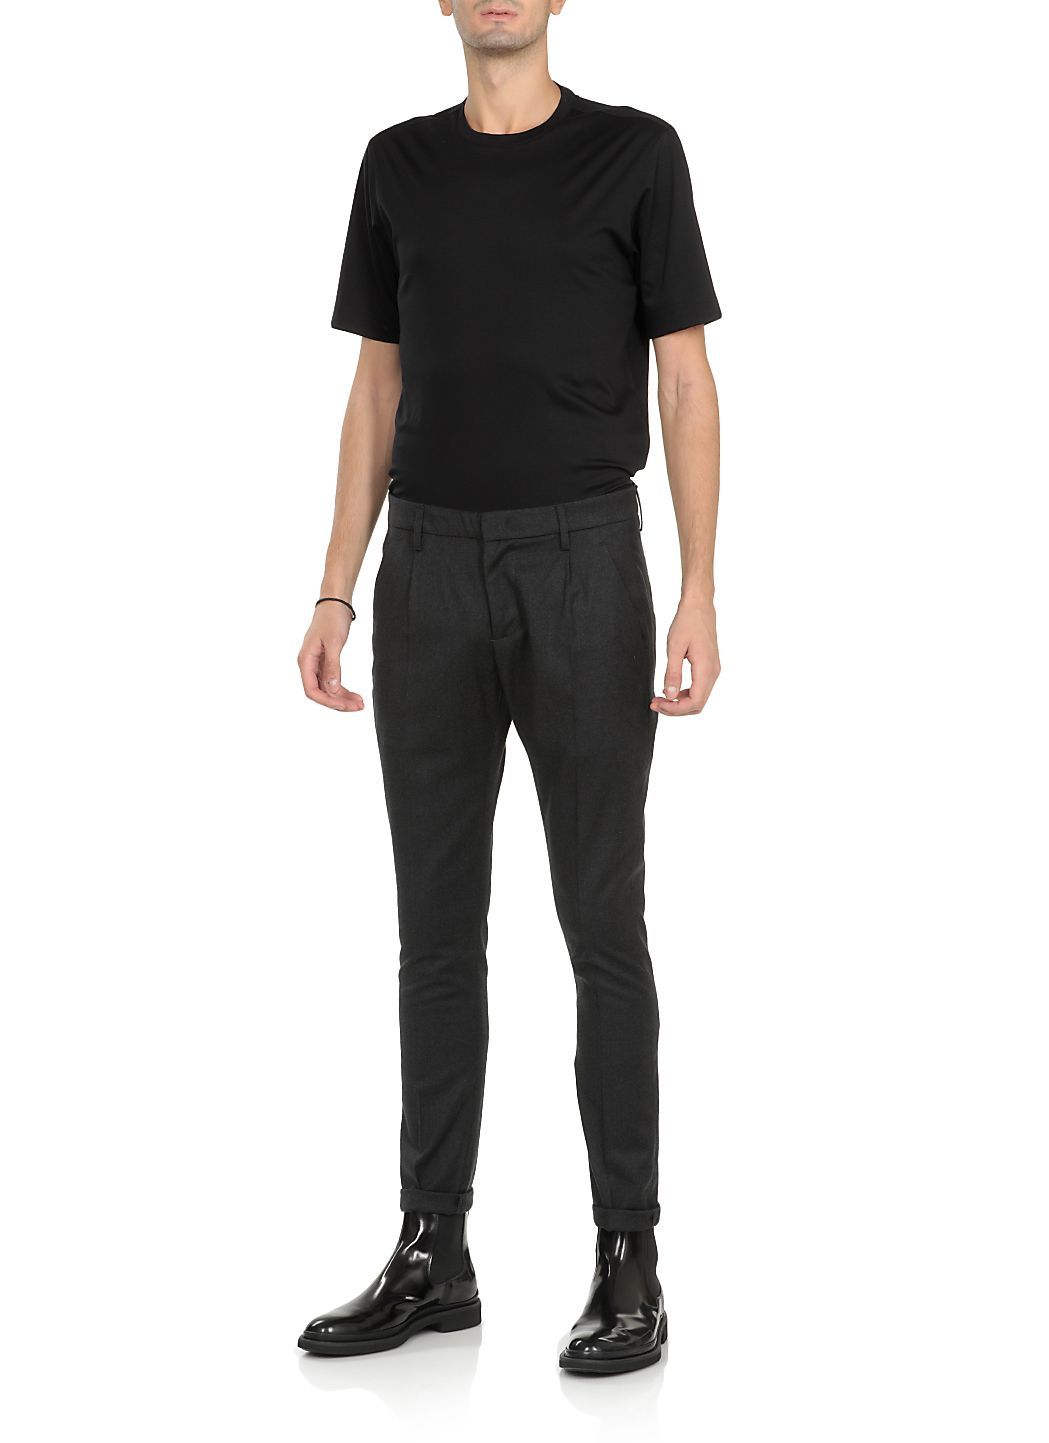 Gaubert Pinces trousers